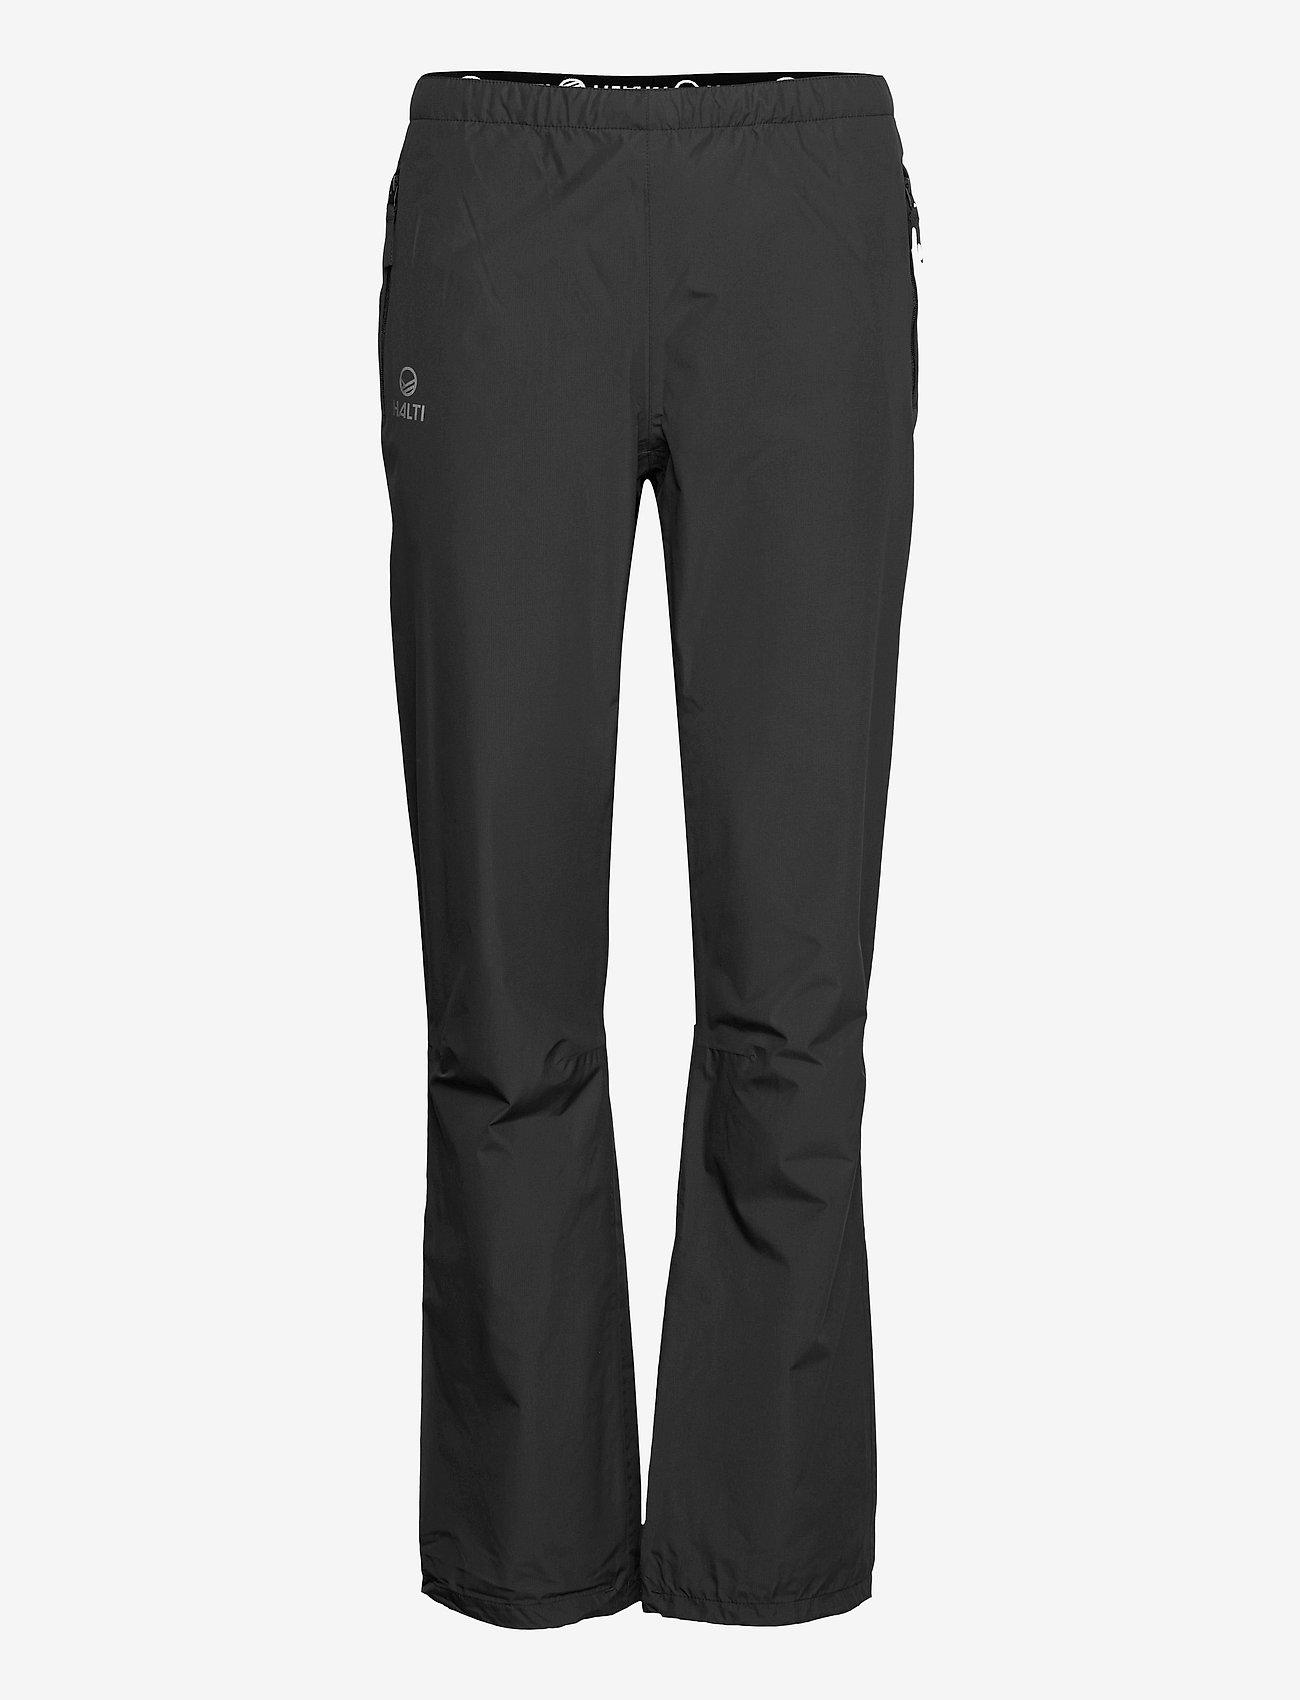 Halti - Fort Women's DrymaxX Shell Pants - friluftsbukser - black - 0